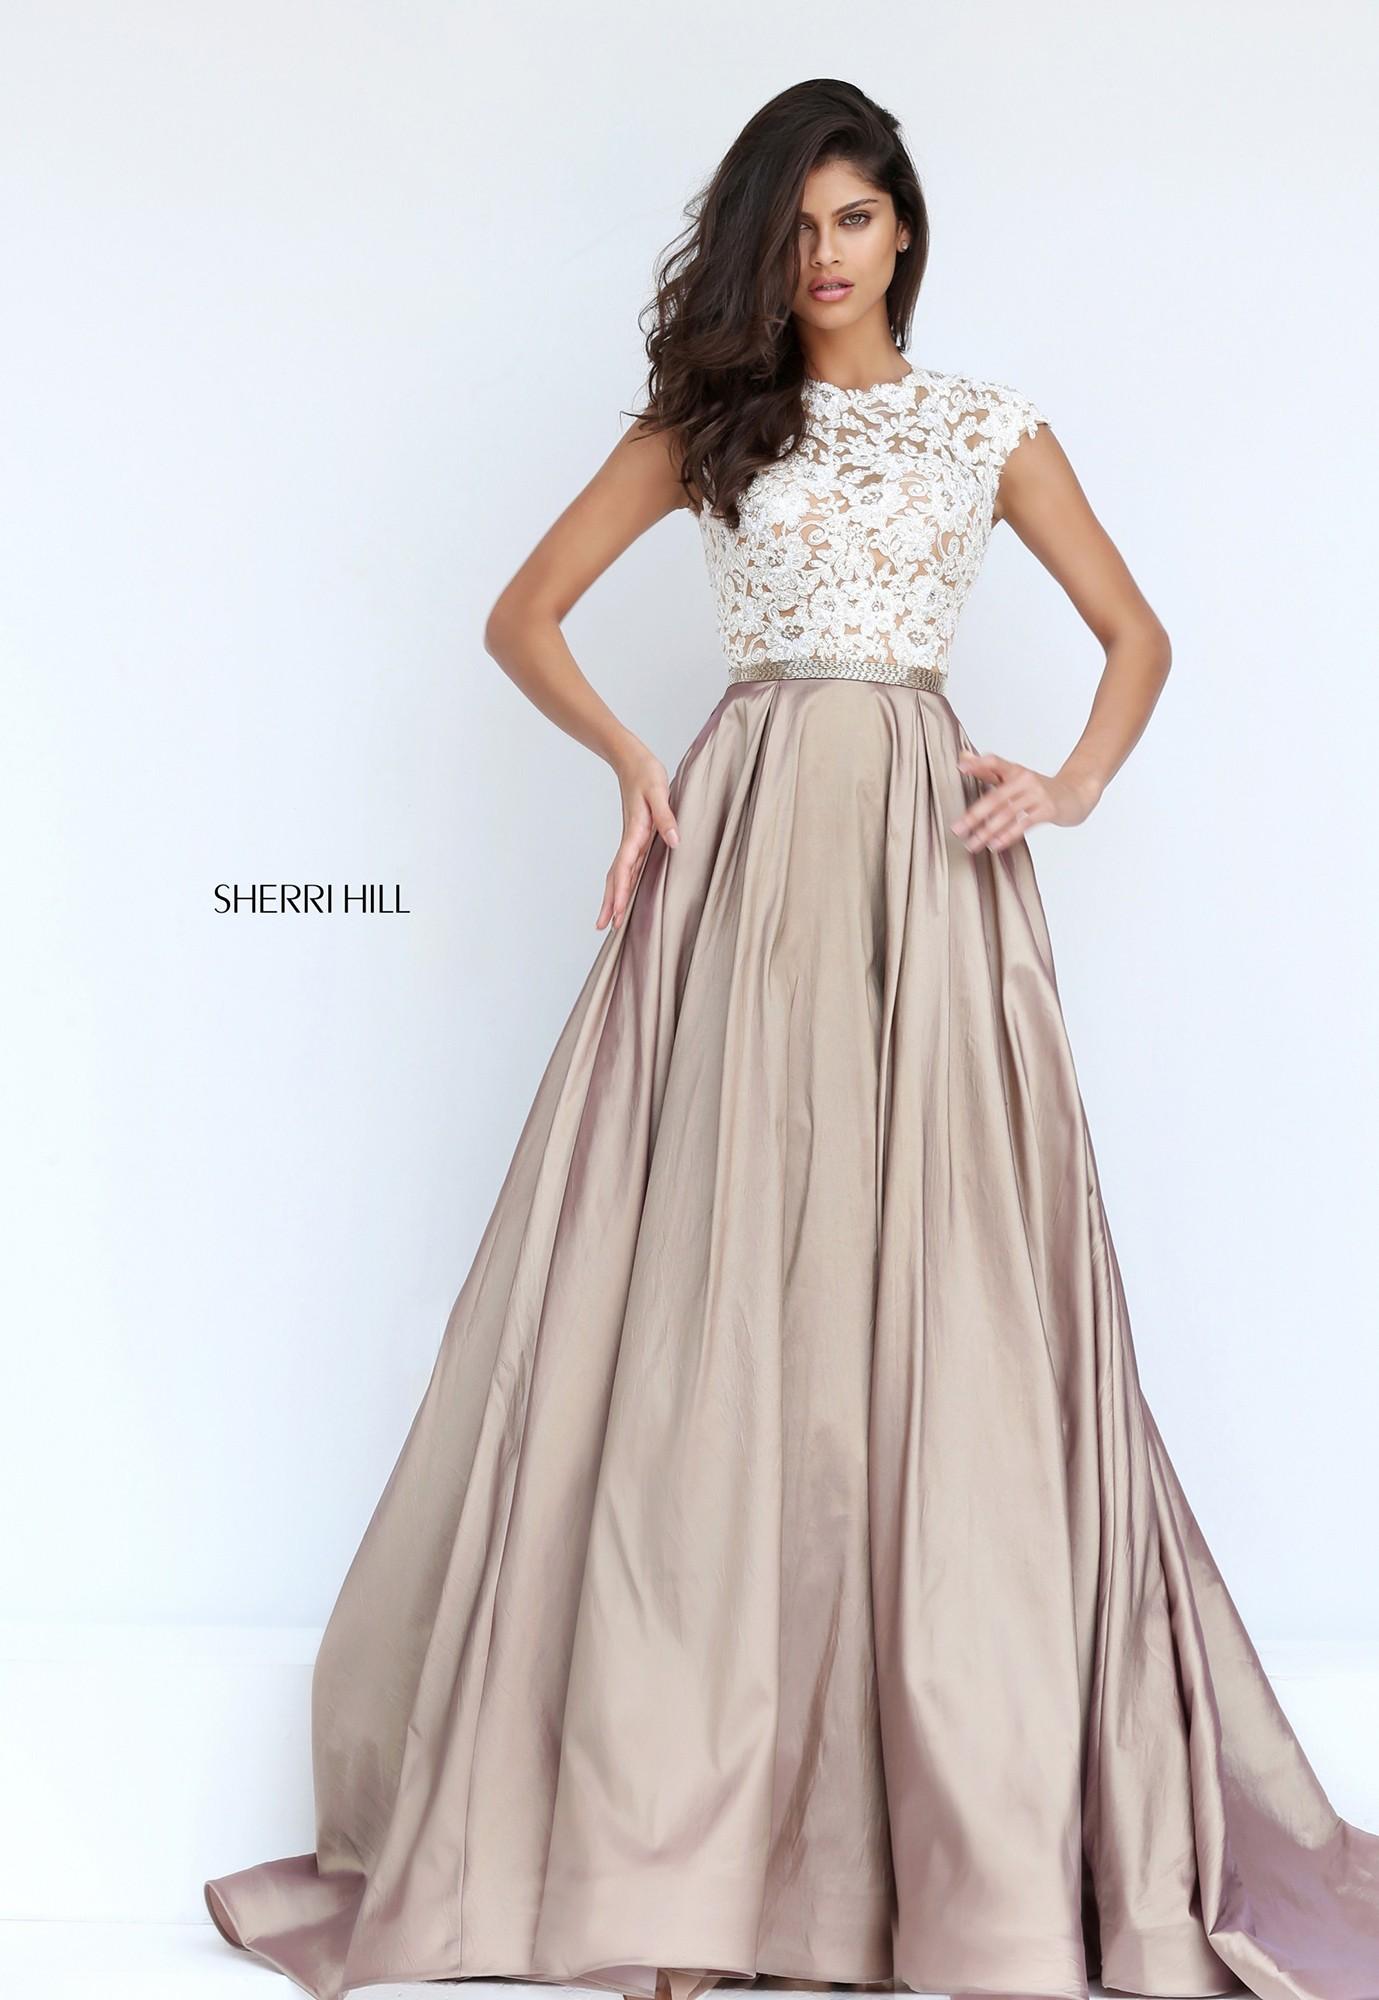 Sherri Hill 50843 Lace Cap Sleeve Open Back Ball Gown